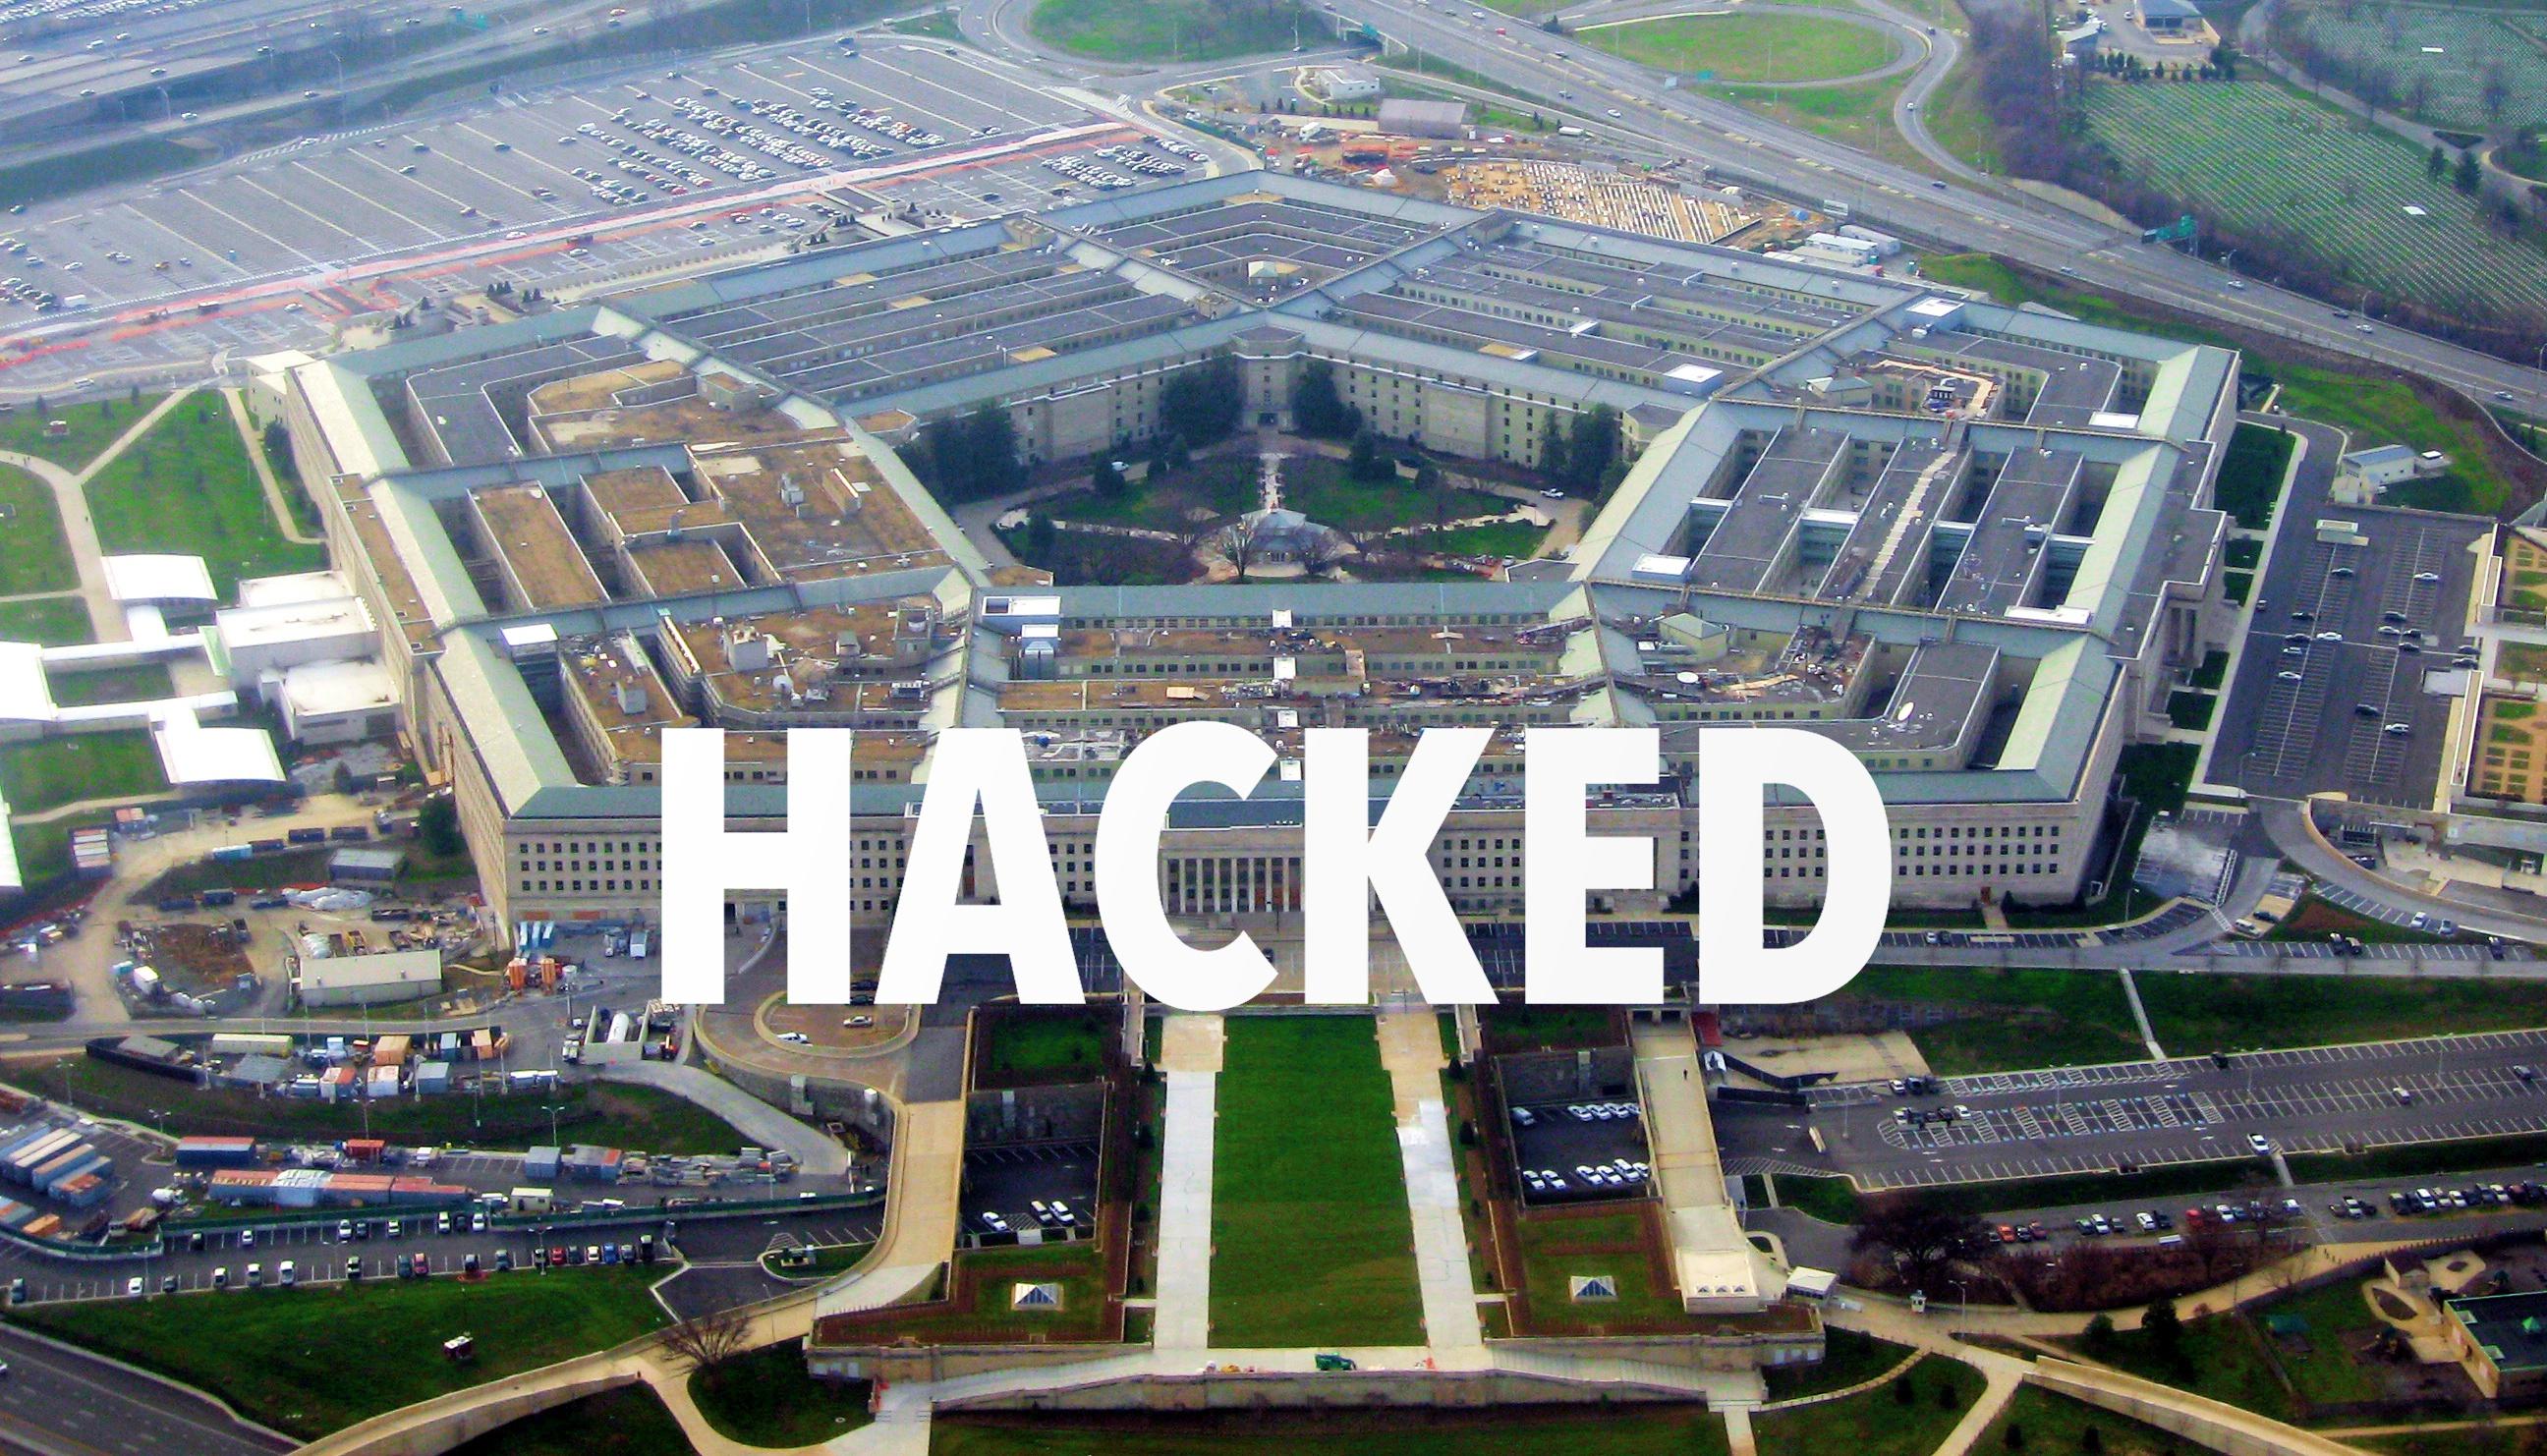 Pentagon-hacked-again